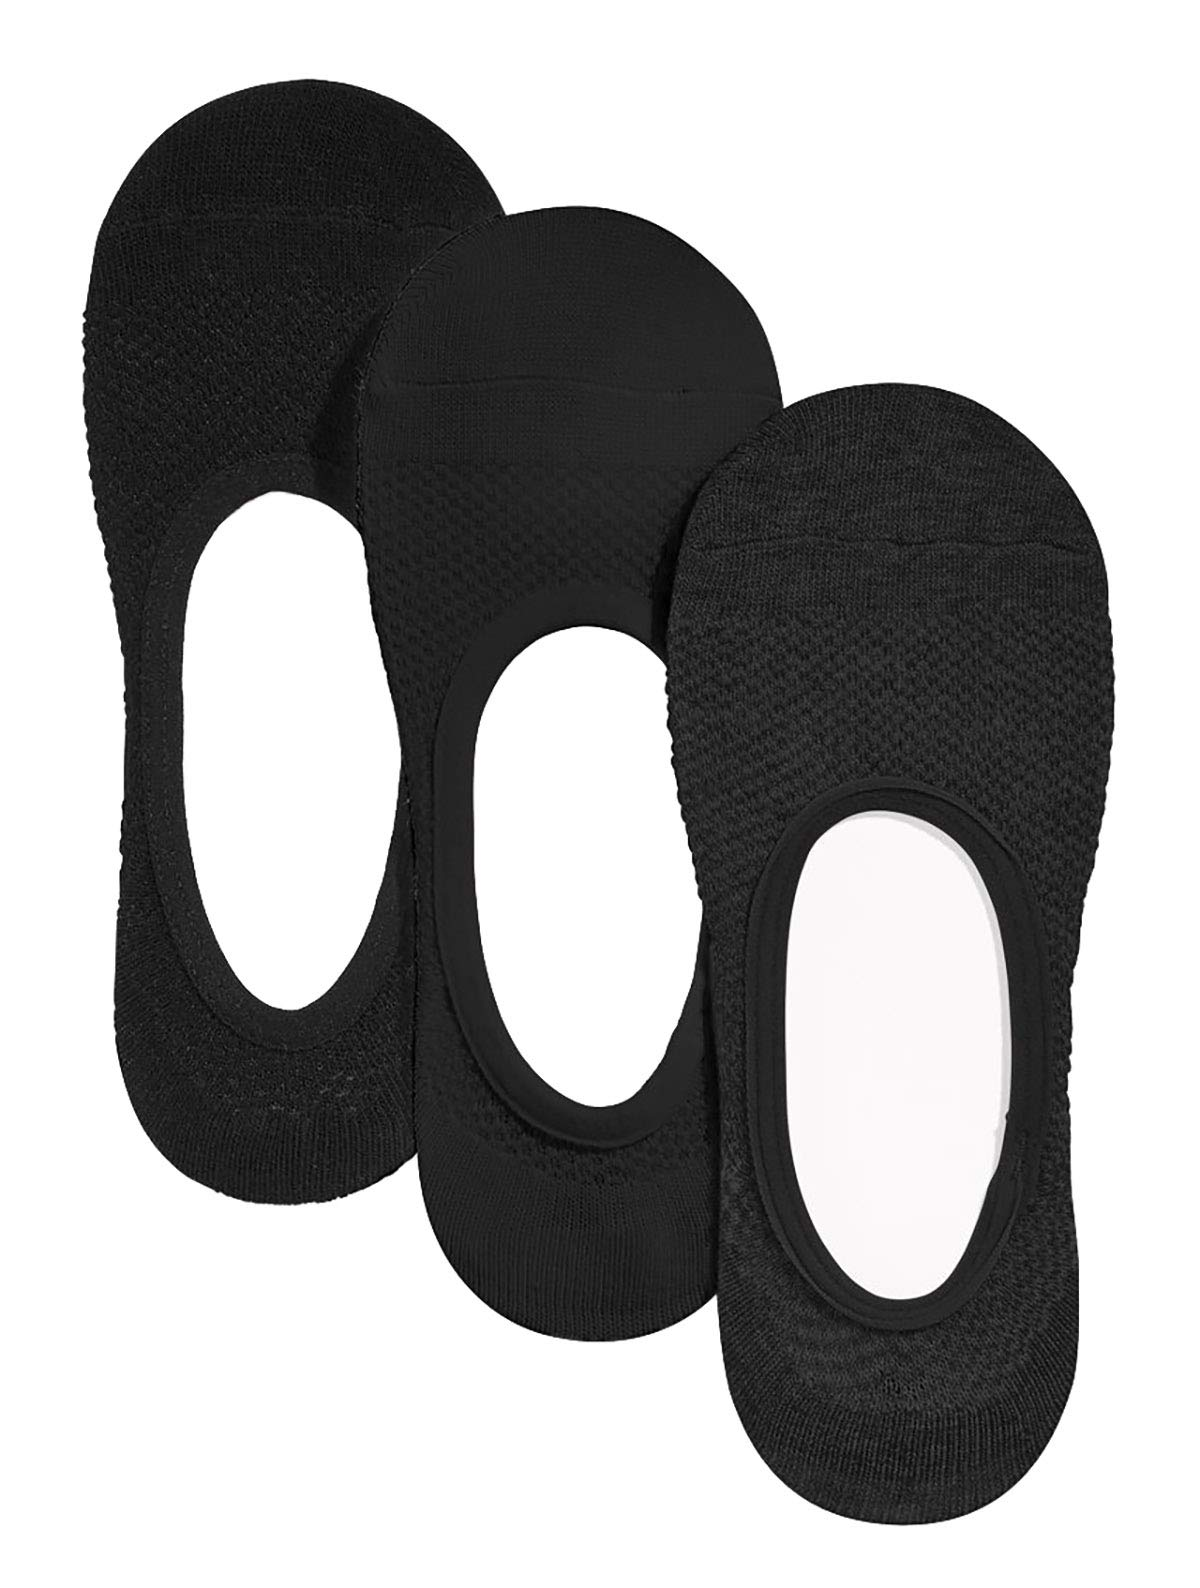 Charter Club Women's High-Cut Liner Socks 3 Pack (Black)